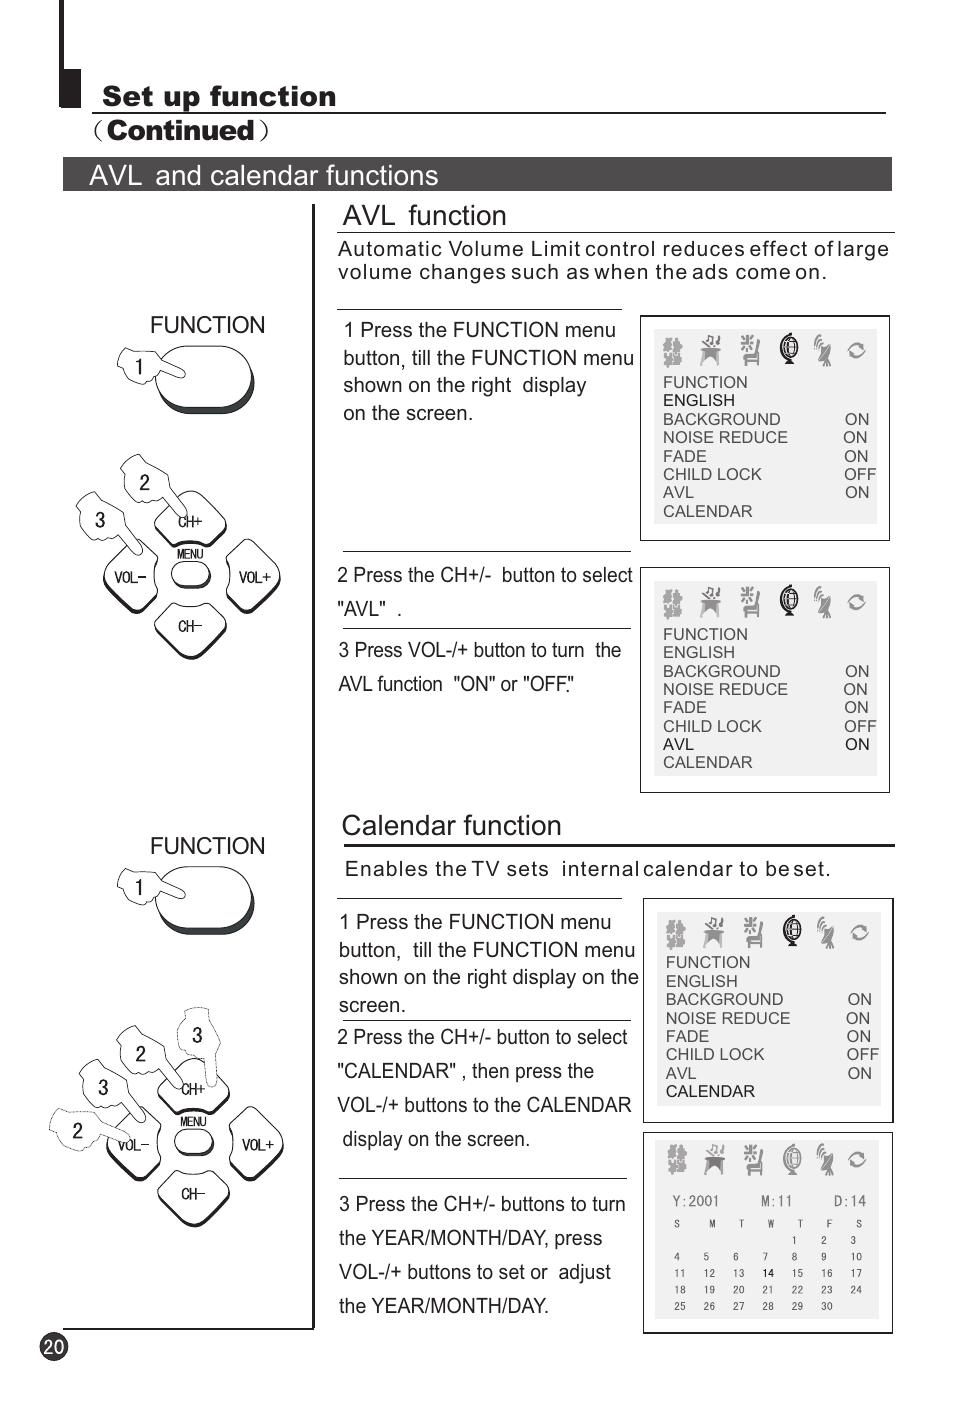 Calendar function, Avl function | haier 29F3A User Manual